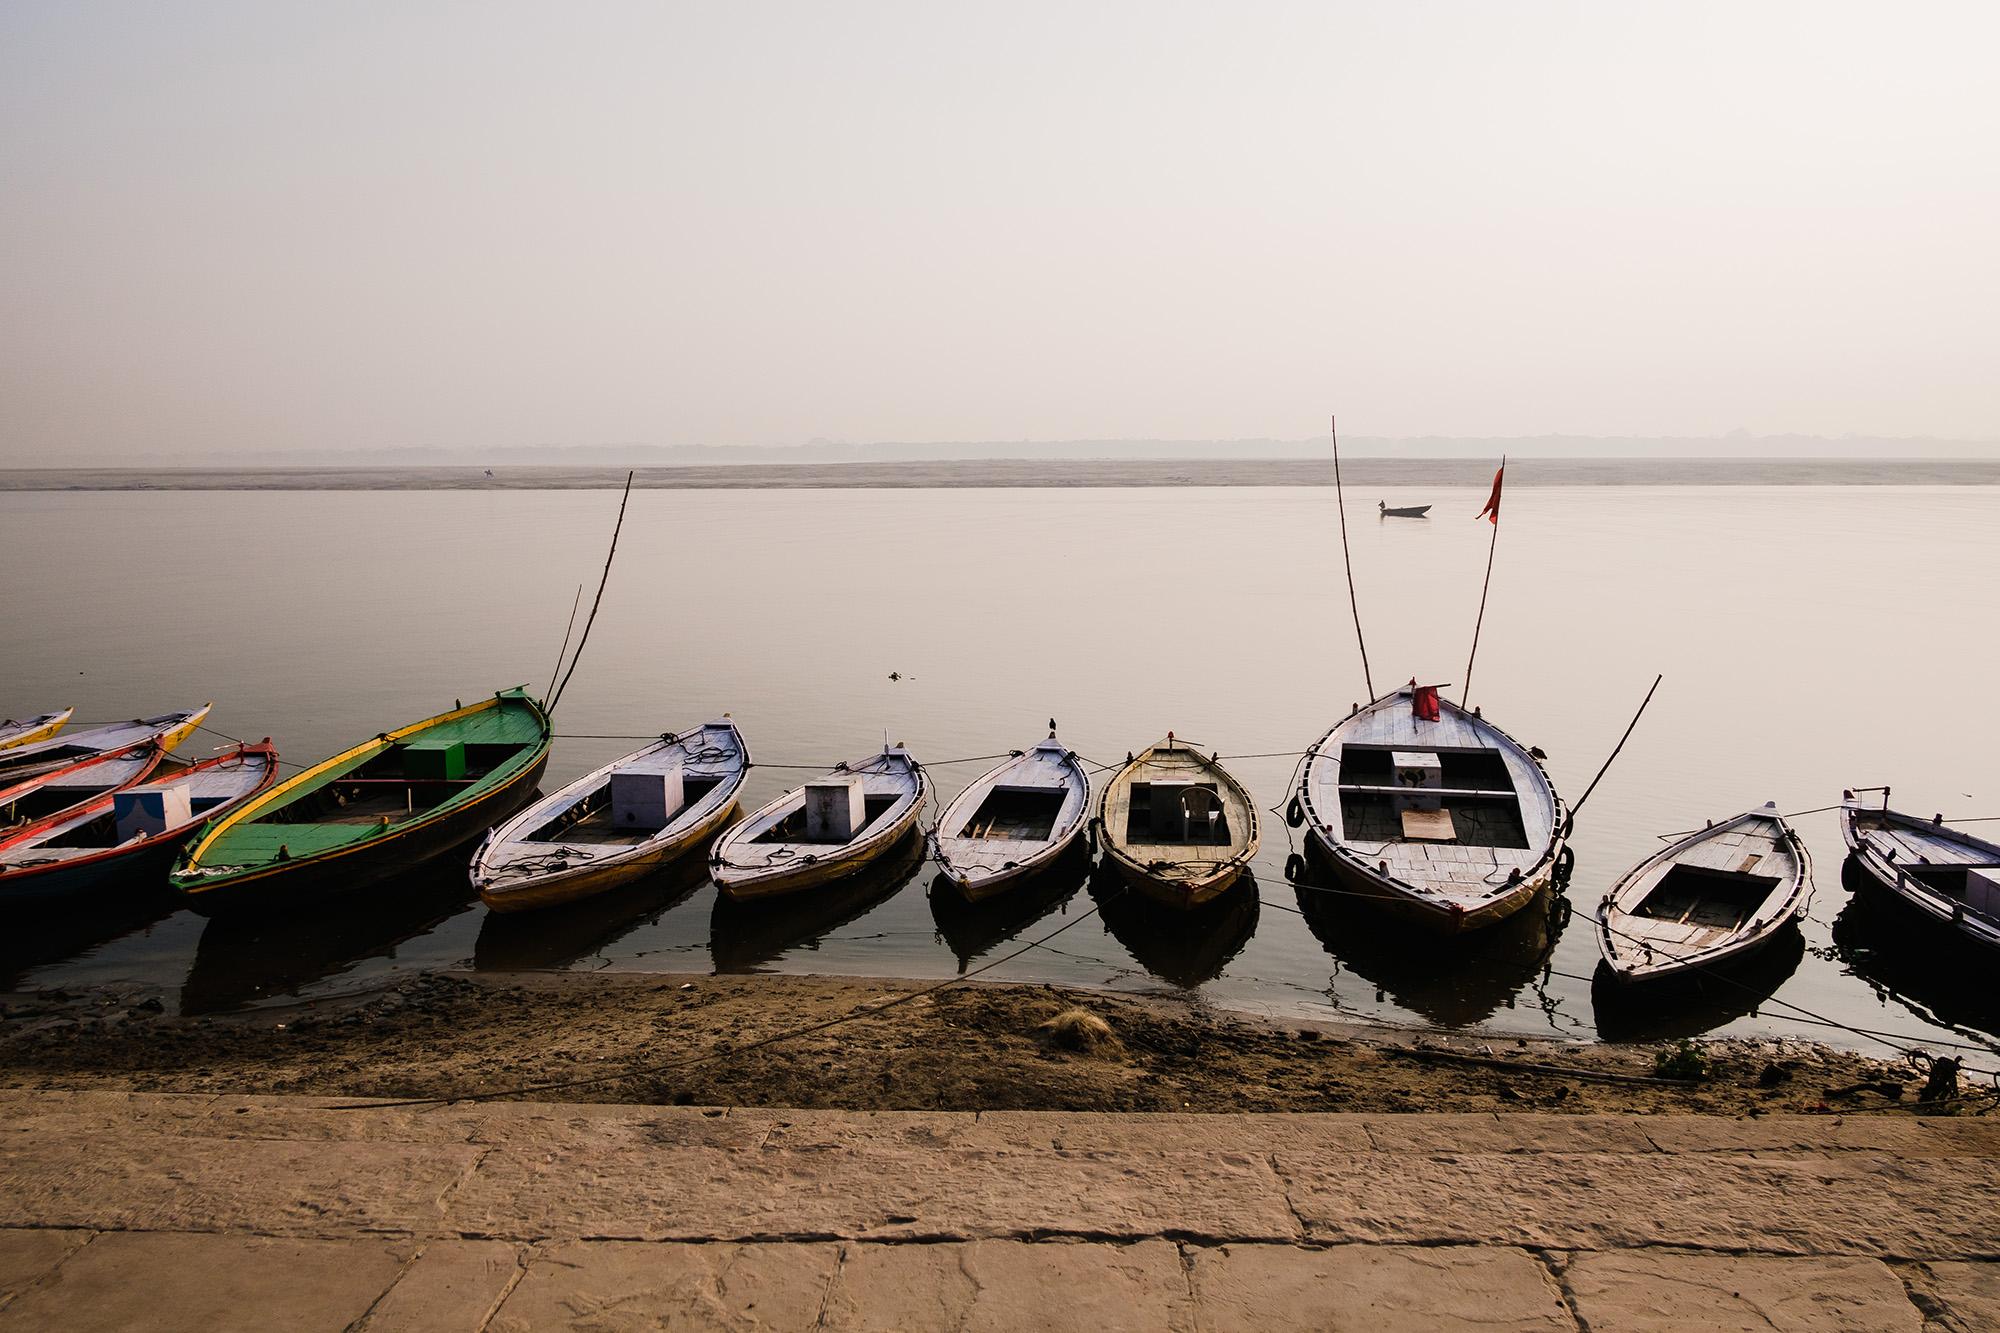 AnjaPoehlmann_India-Varanasi_117.jpg